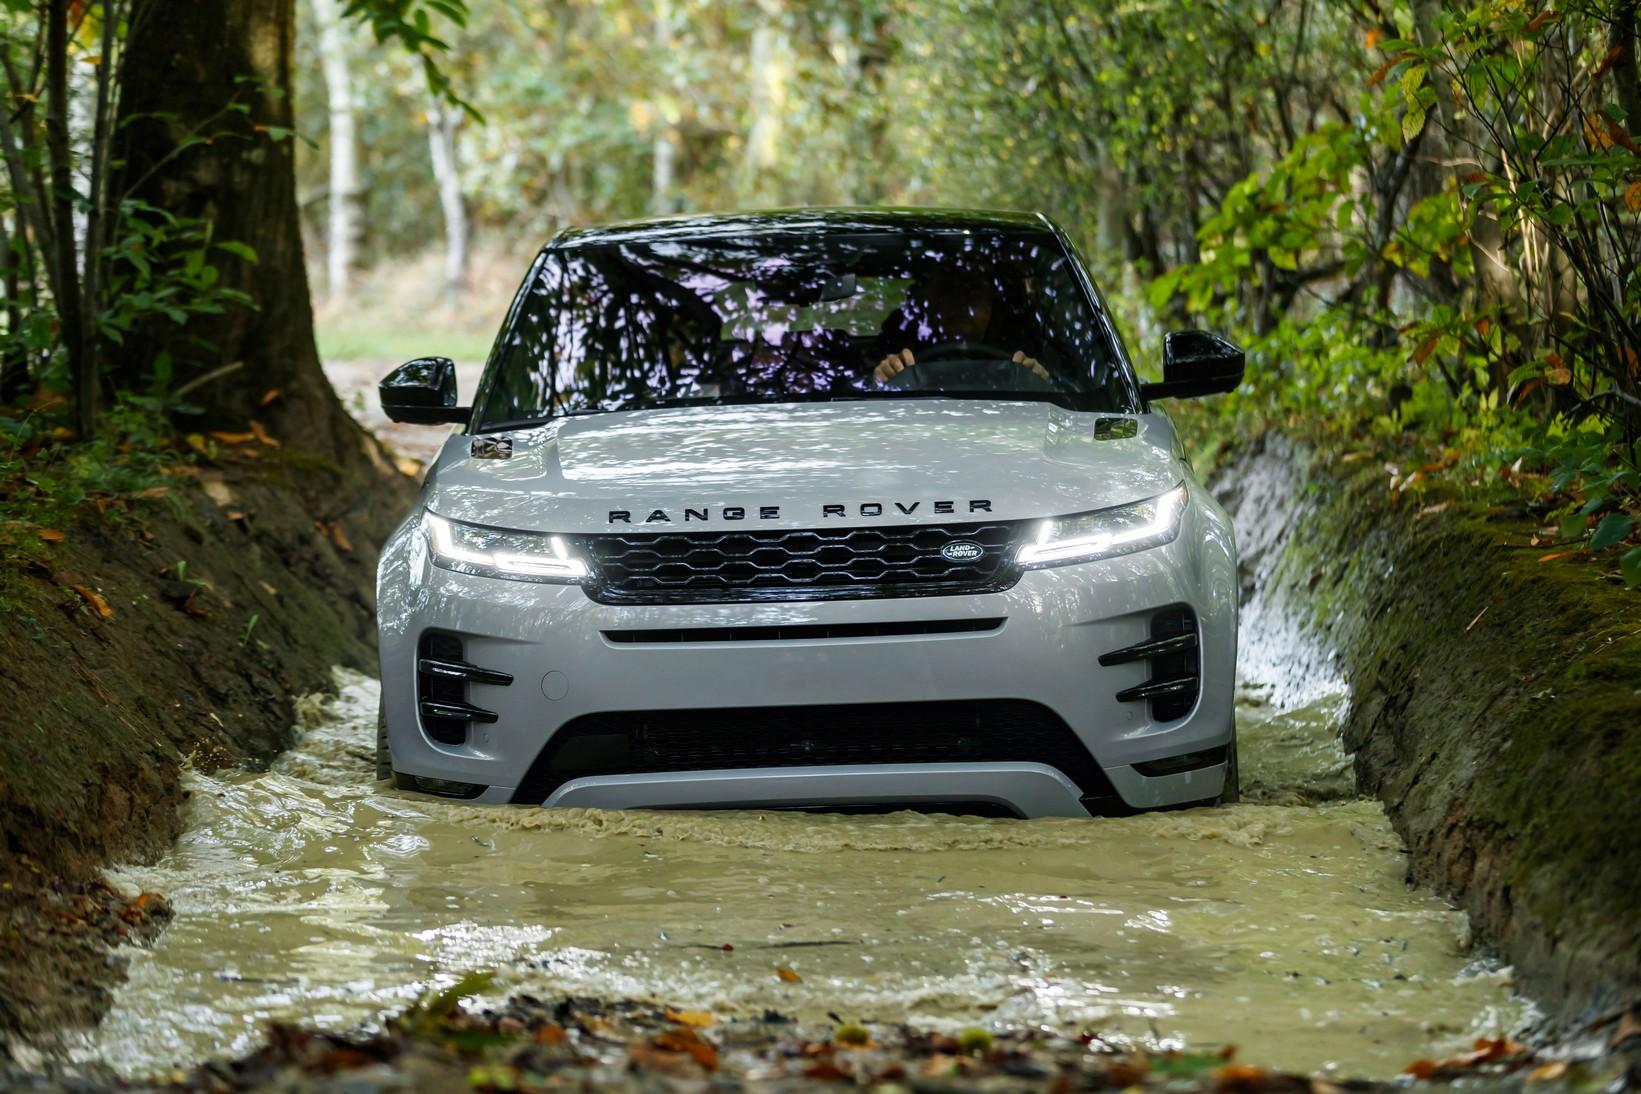 Land Rover Range Rover Evoque 2.0 D180 R-Dynamic SE 5dr Auto image 2